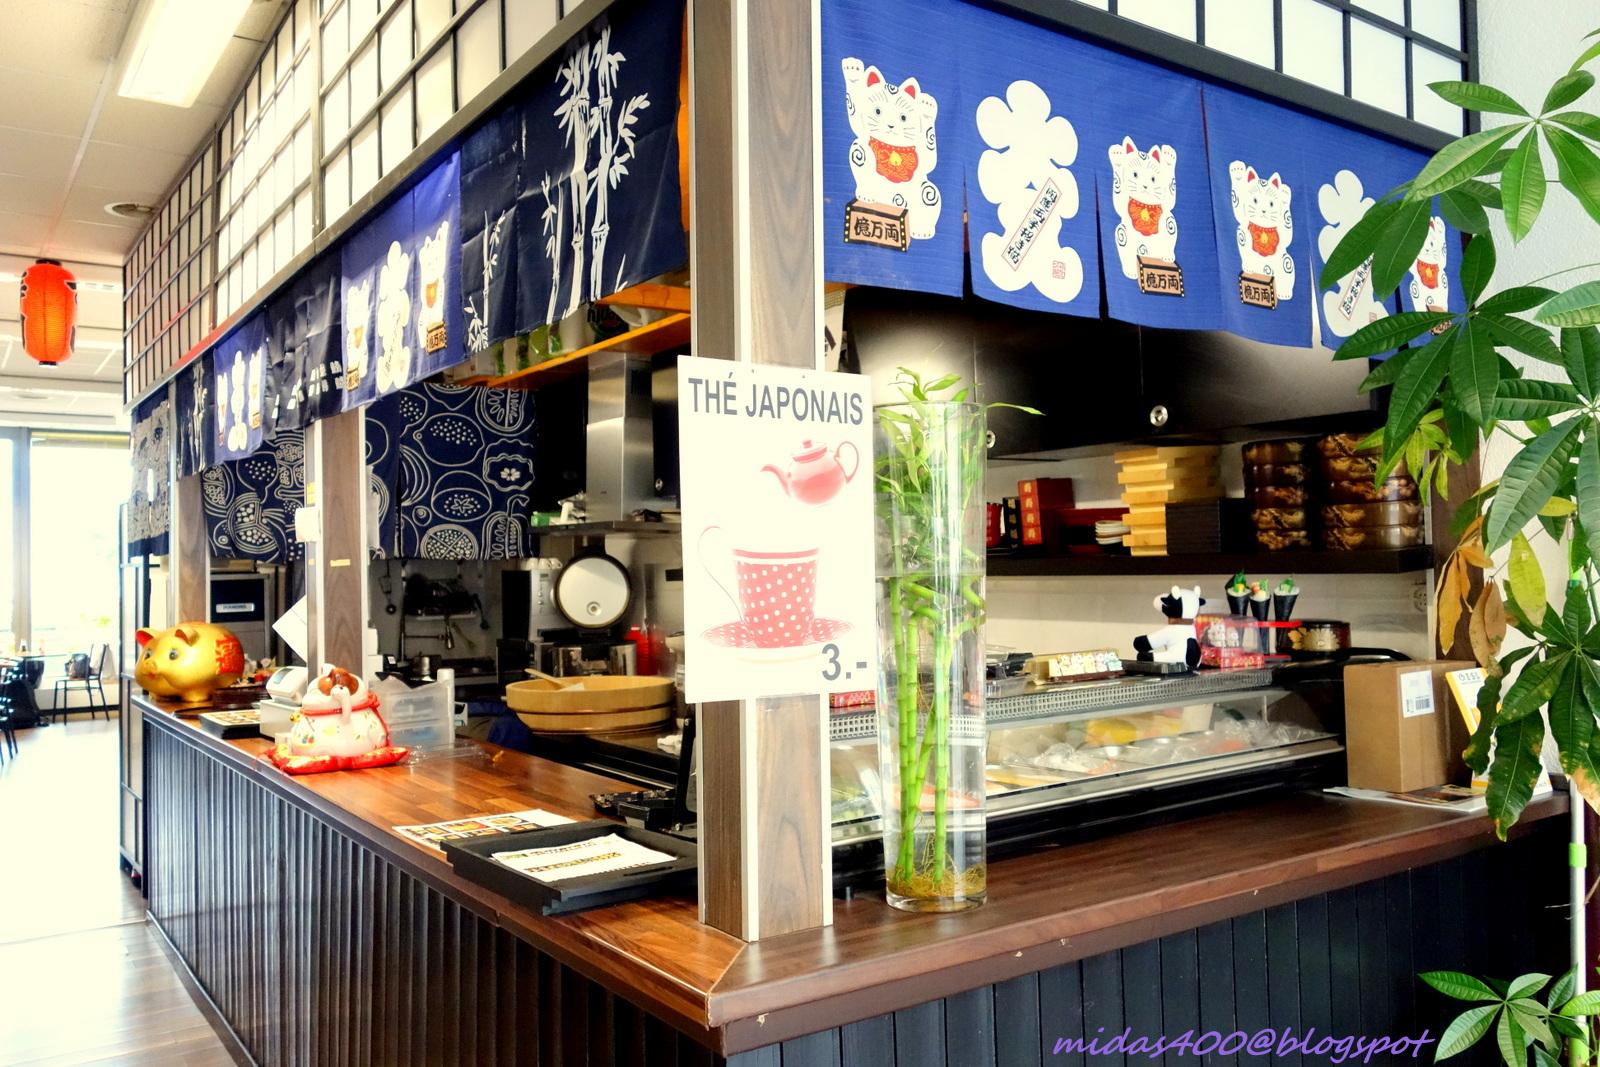 Midas Food Travel Blog Asian Restaurants Switzerland